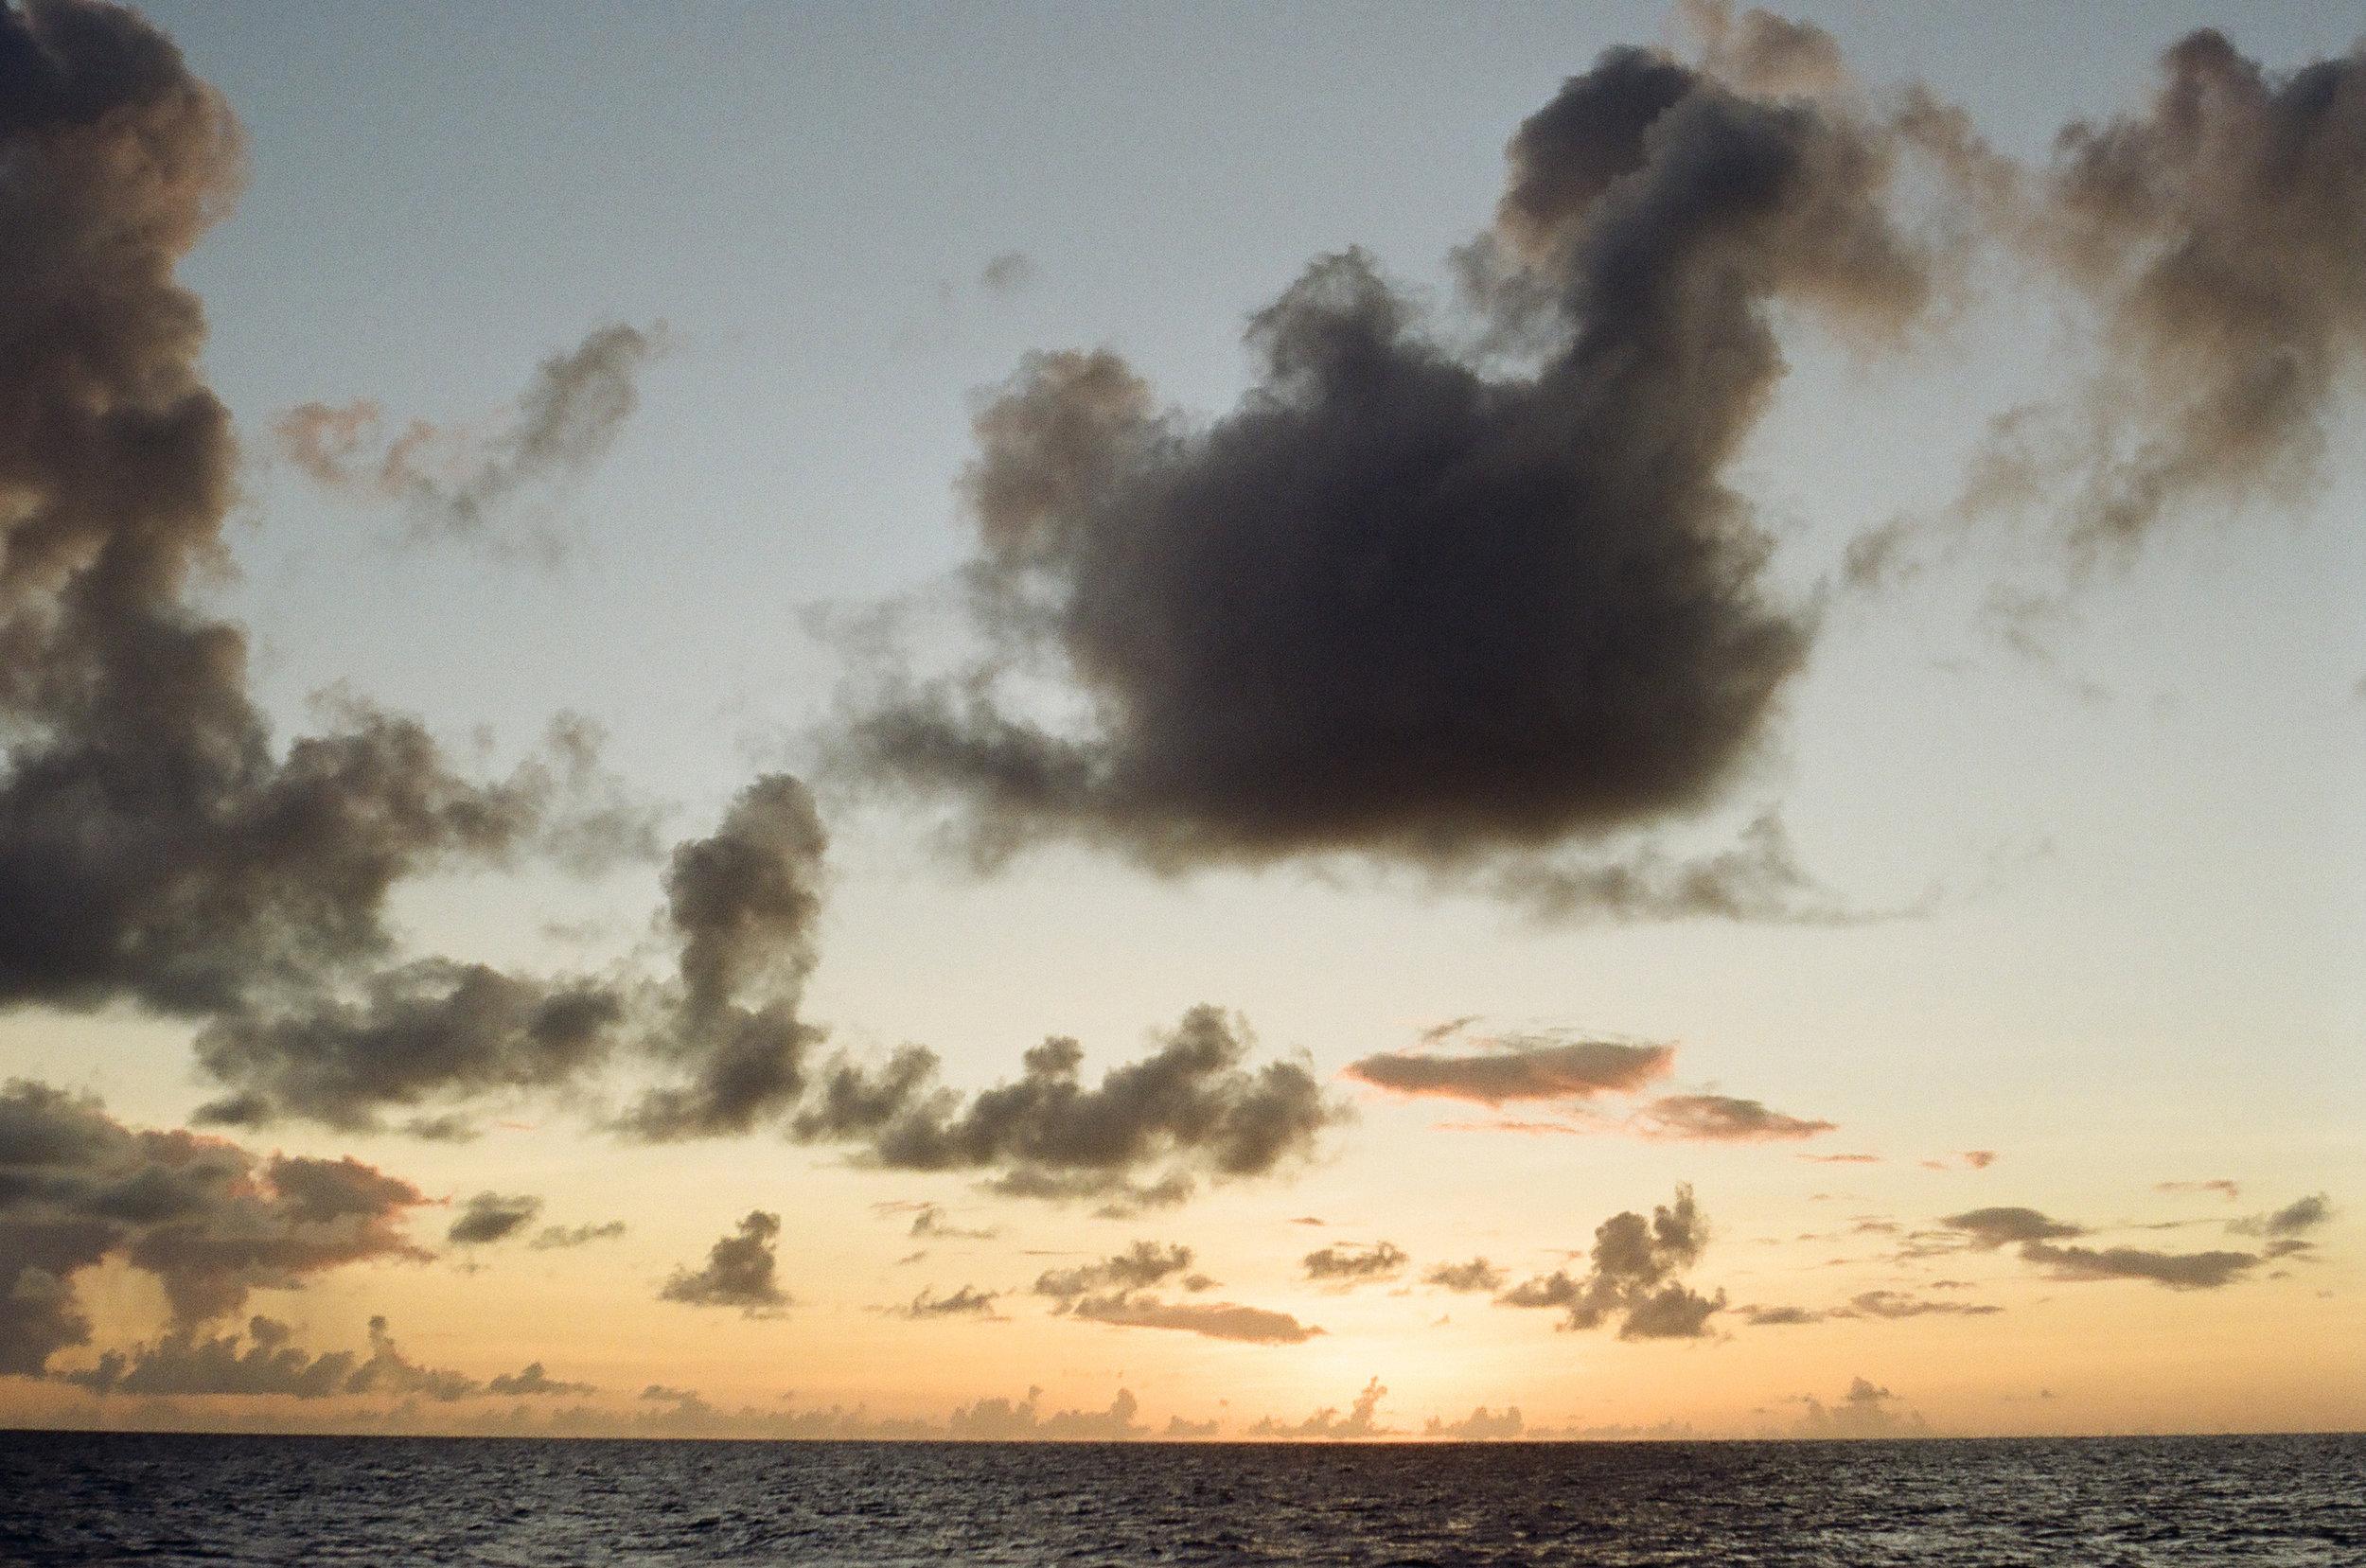 Caribbean Sea, November 2017 | Praktica MTL 5 B | Kodak Gold